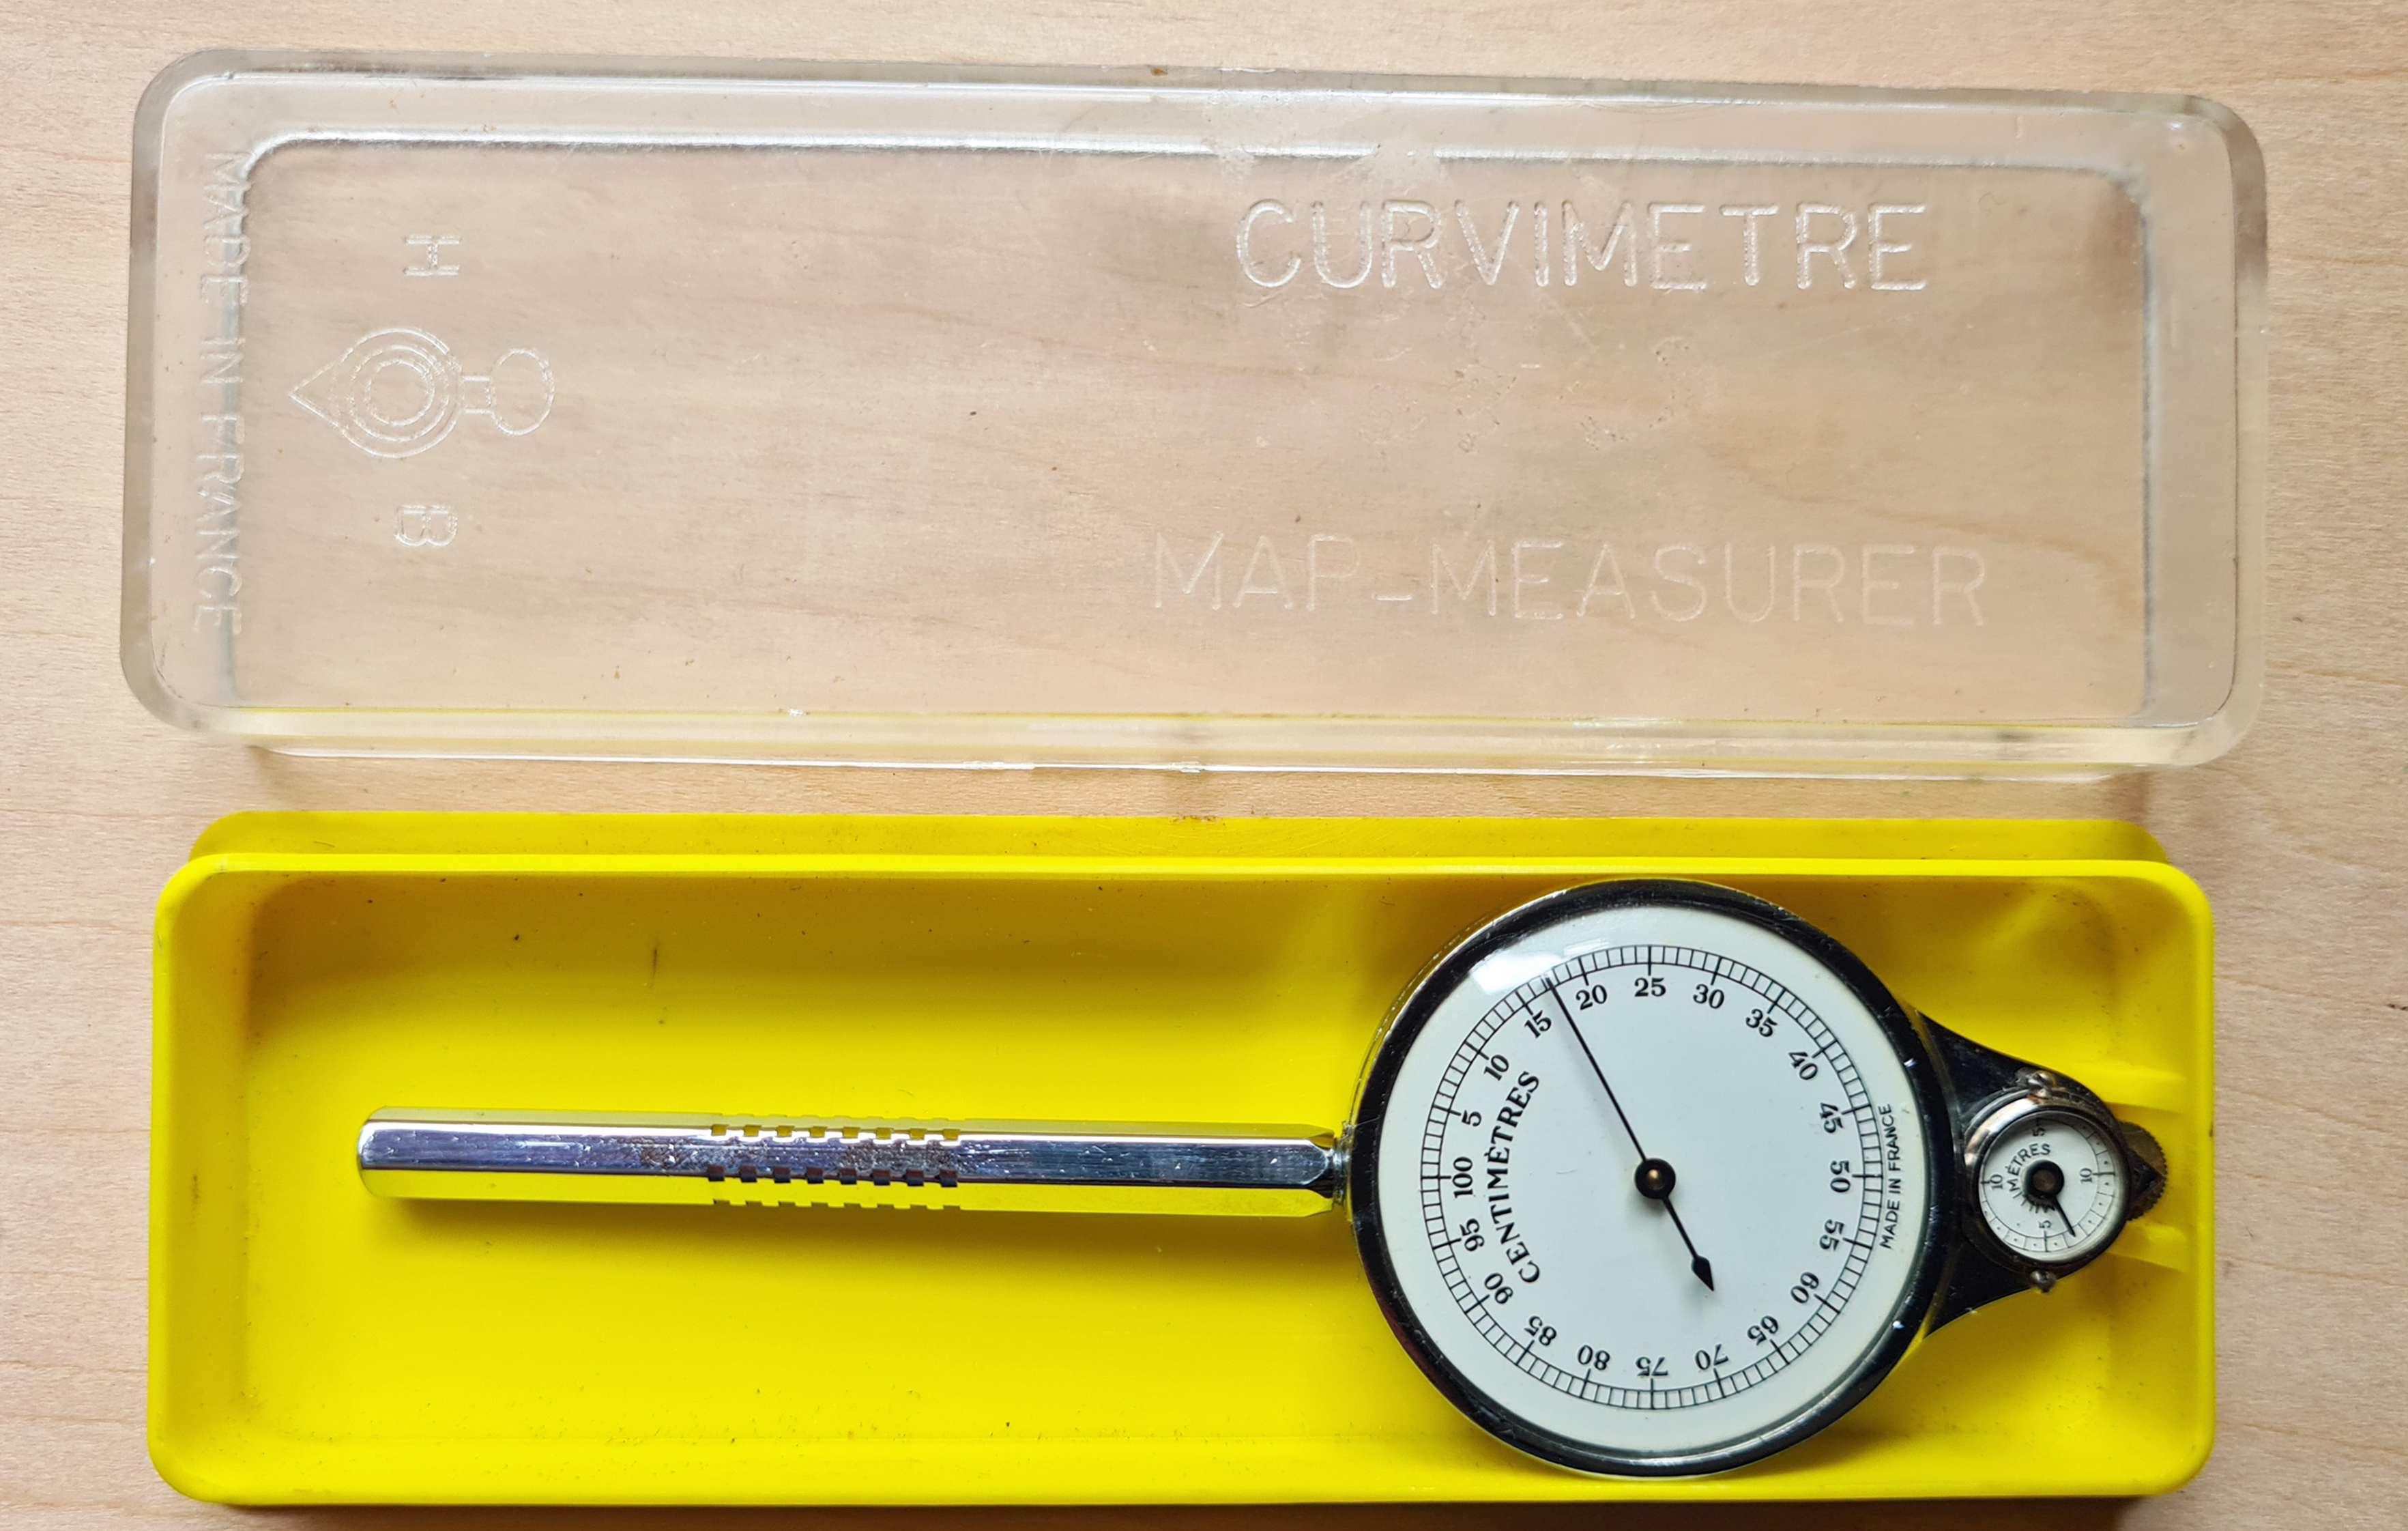 HB Curvimetre 54M in its plastic case